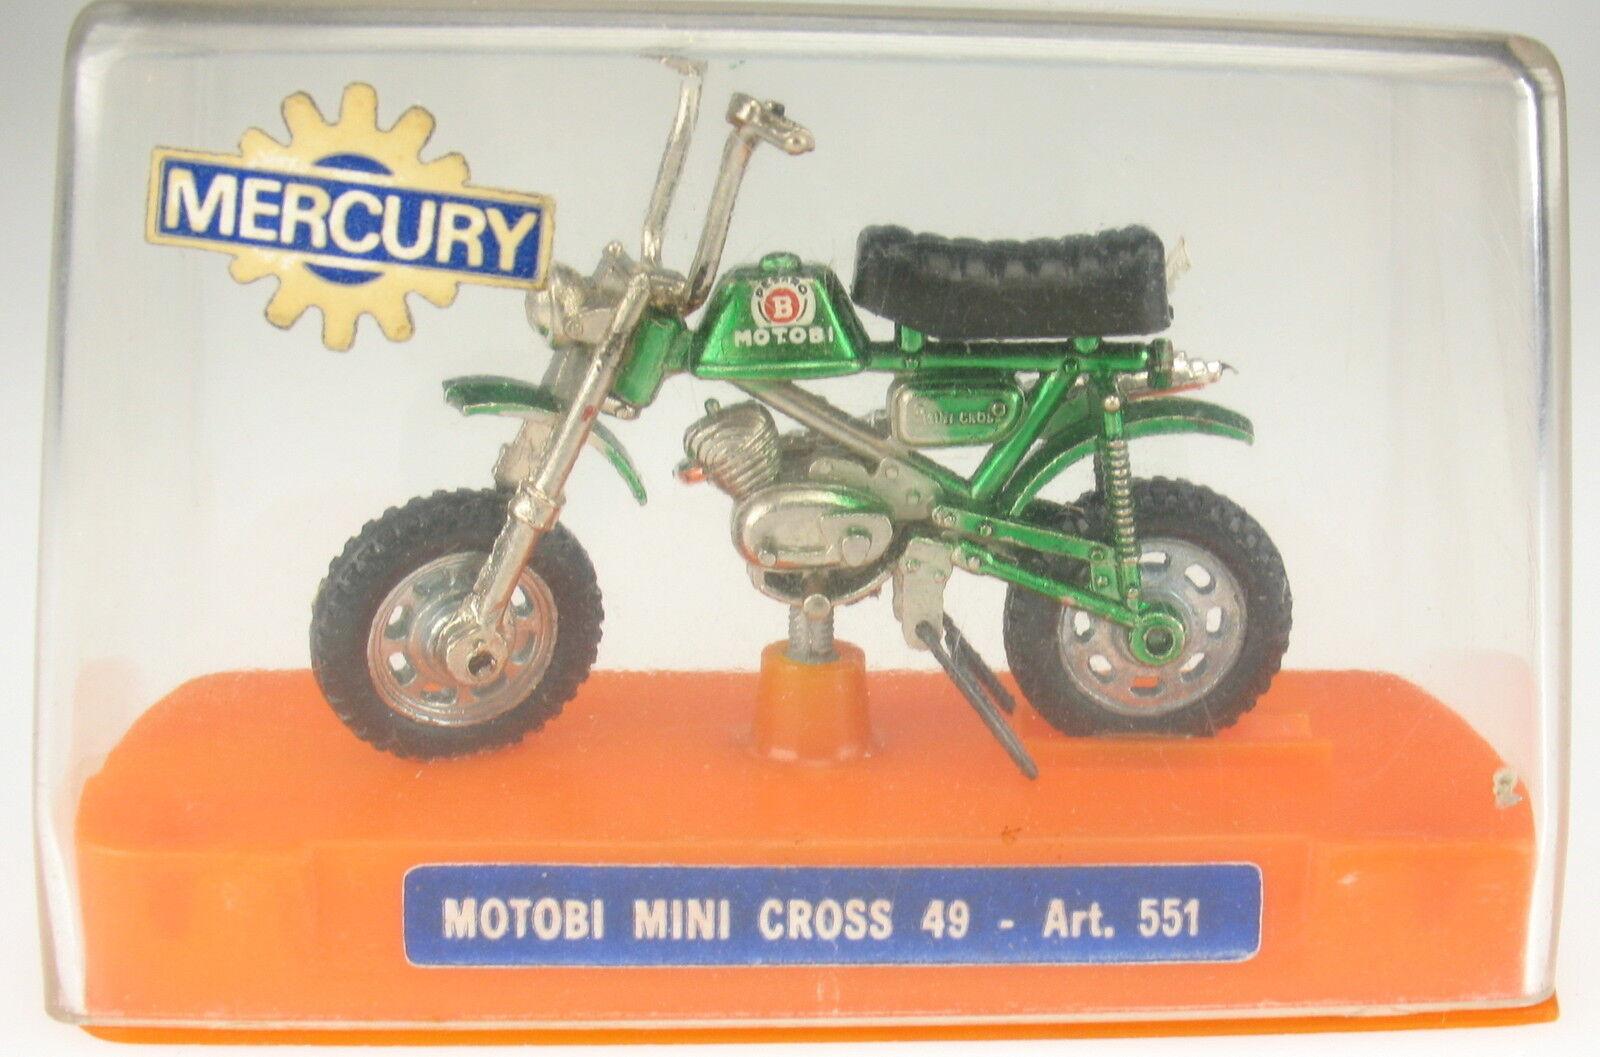 MERCURY 551 - MOTOBI Mini Cross 49 - 1 24 - in OVP   Box - Motorrad Motorcycle 2